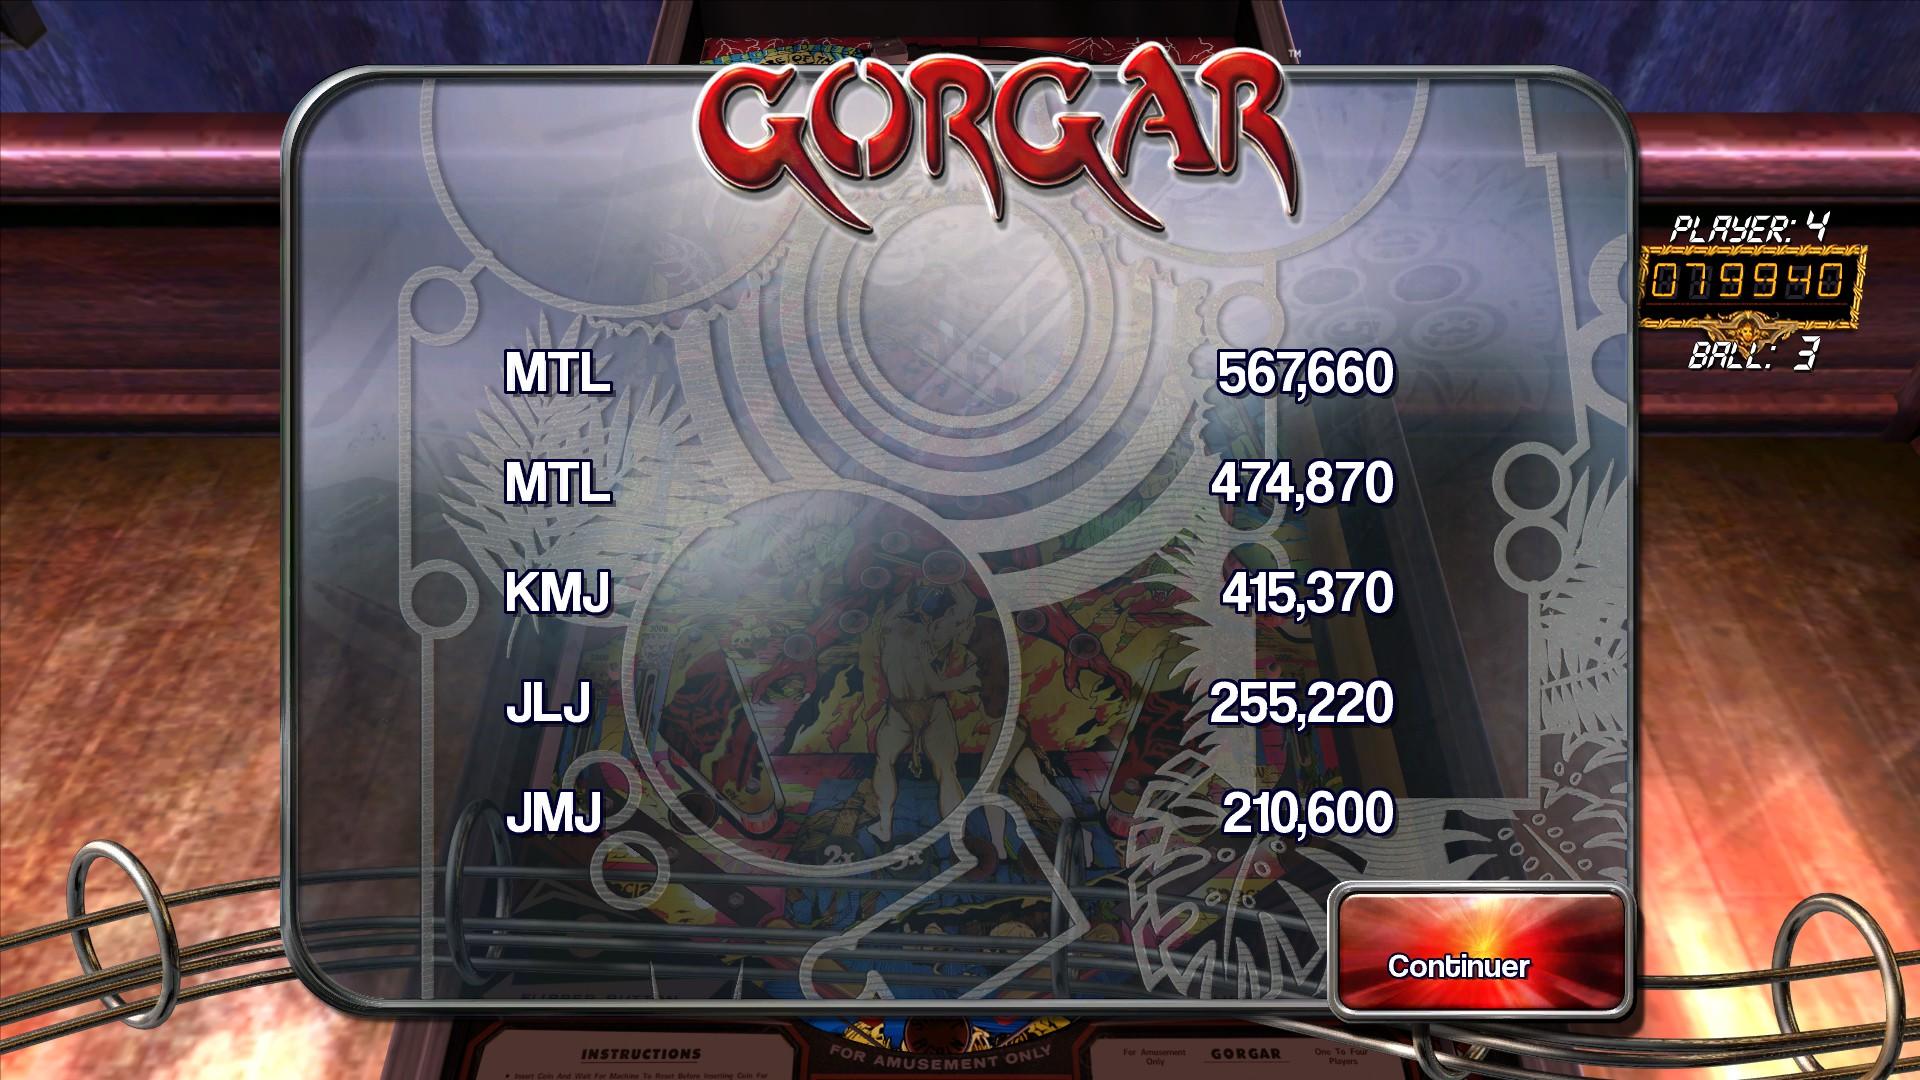 Mantalow: Pinball Arcade: Gorgar (PC) 567,660 points on 2015-05-11 06:21:53